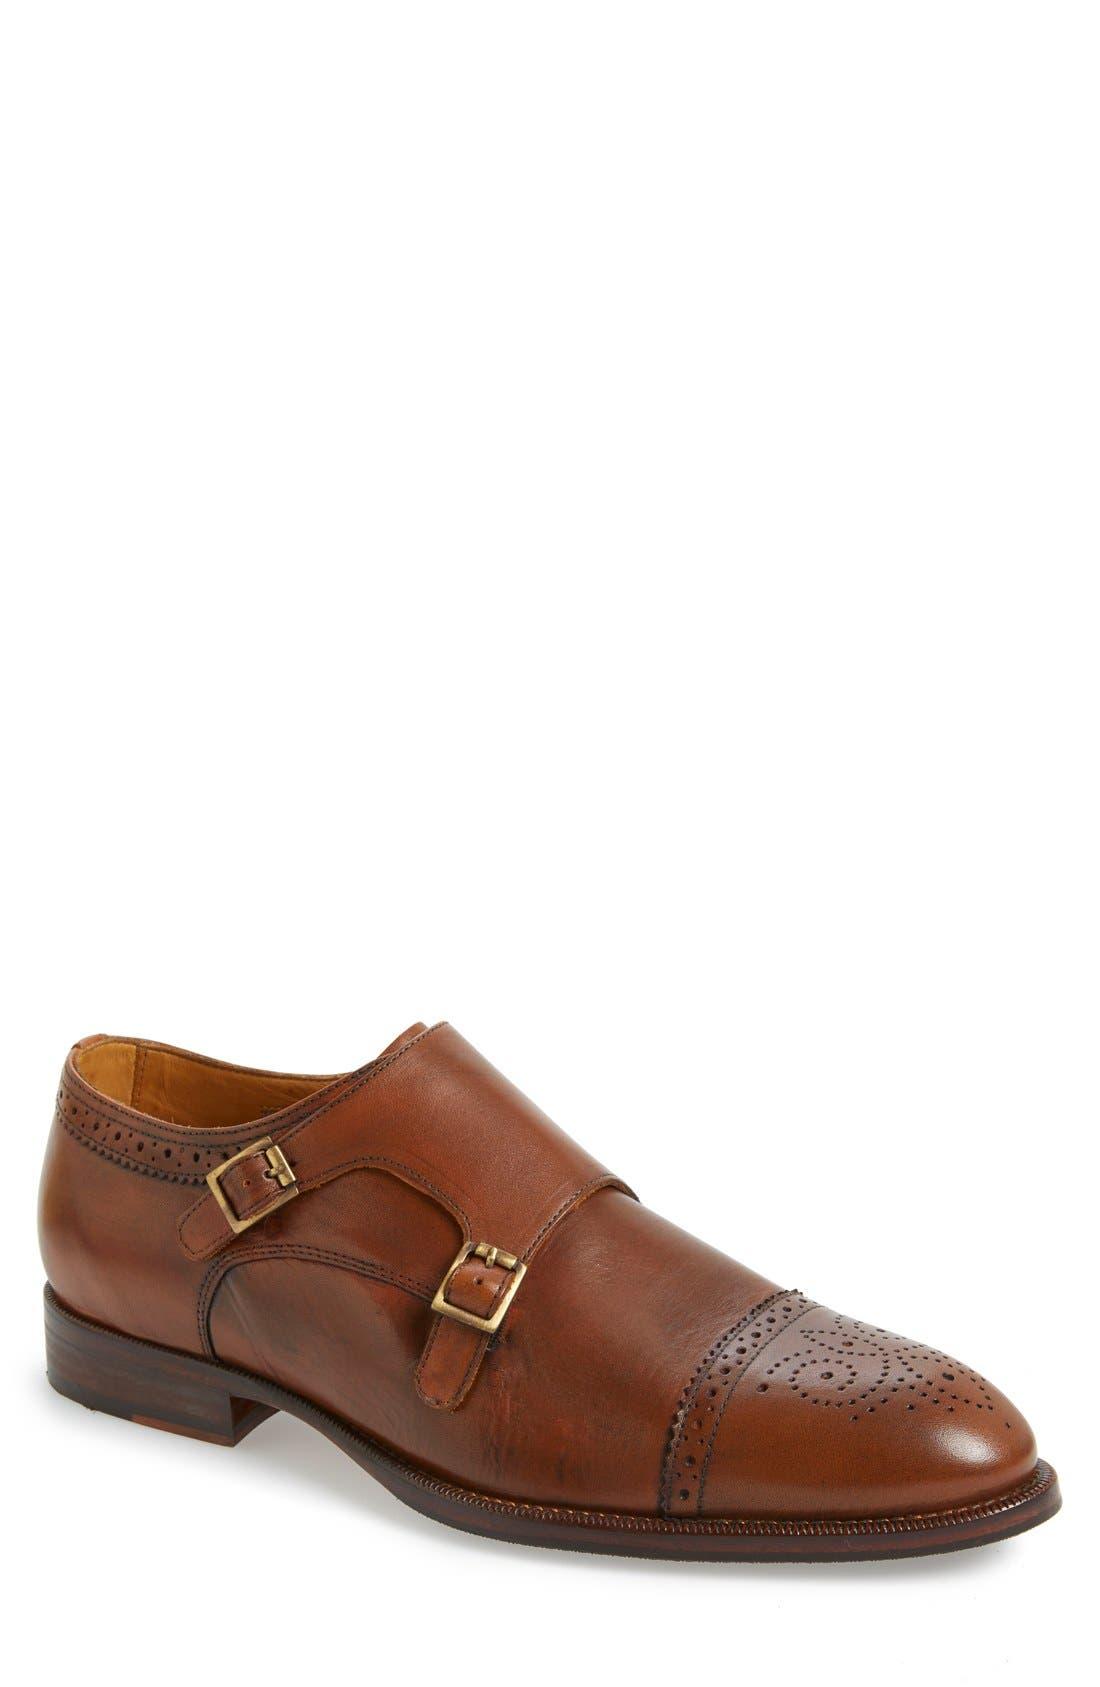 Alternate Image 1 Selected - Vince Camuto 'Briant' Double Monk Strap Shoe (Men)